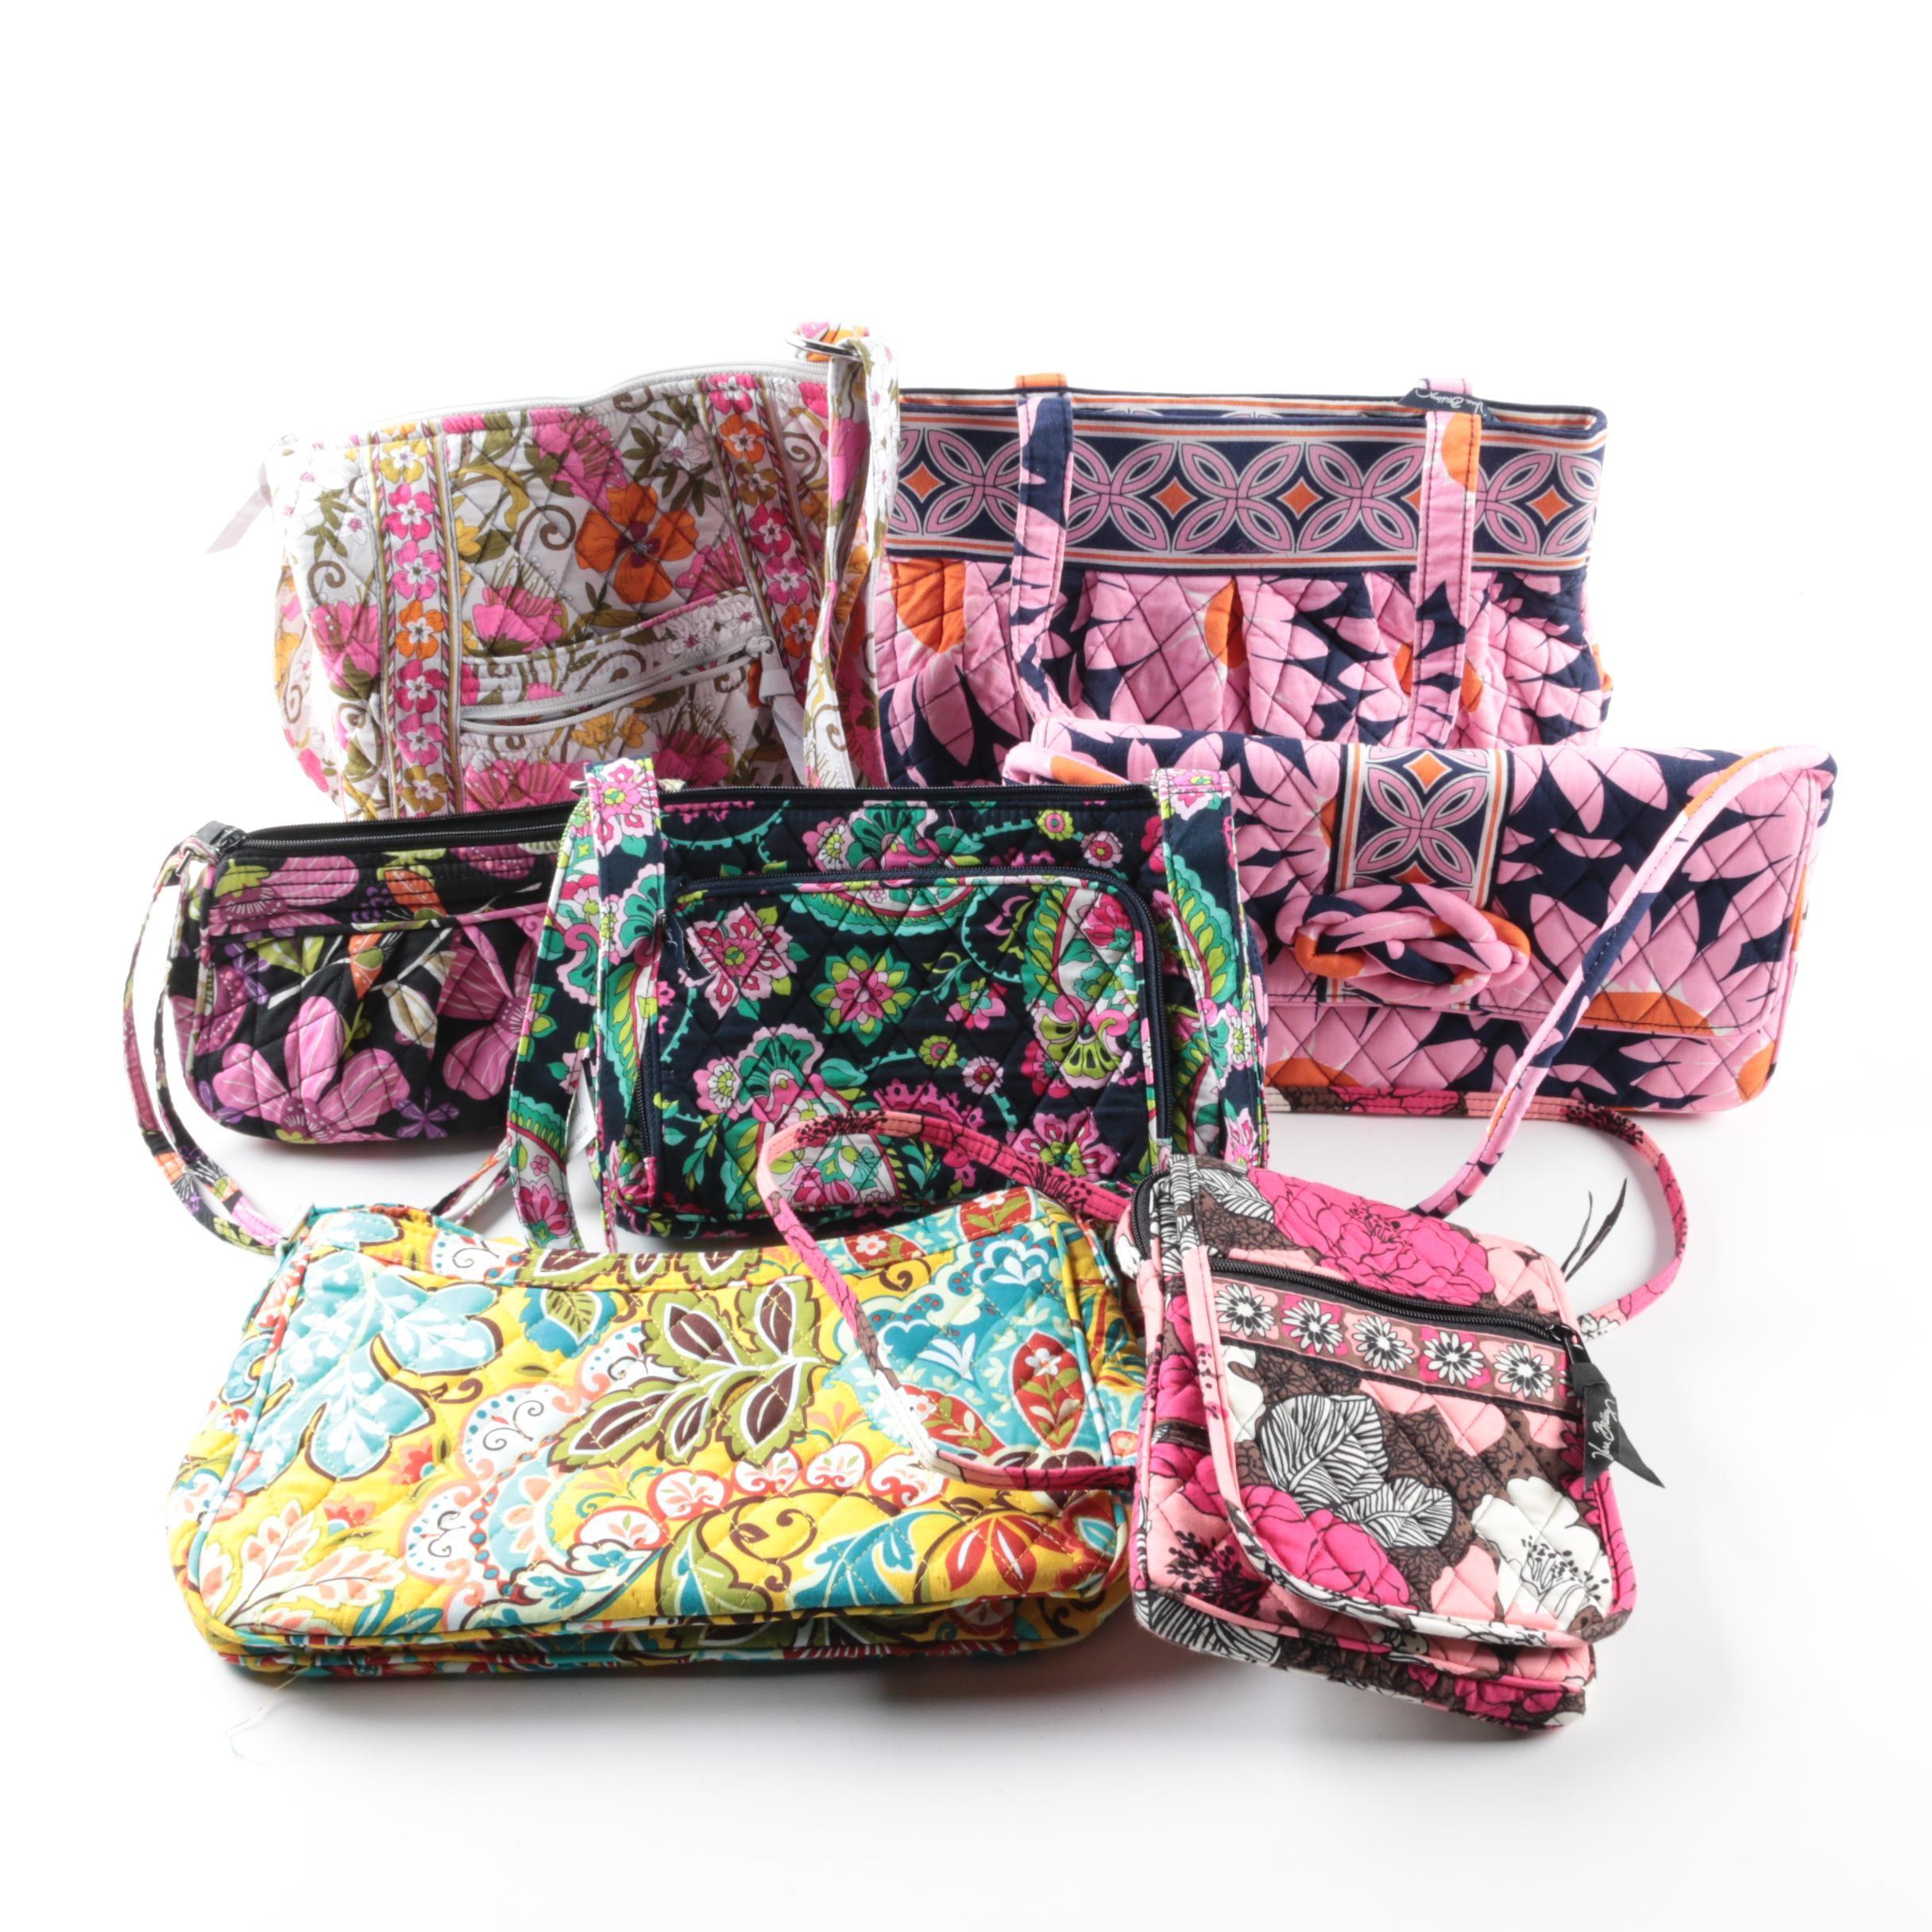 Vera Bradley Quilted Handbags